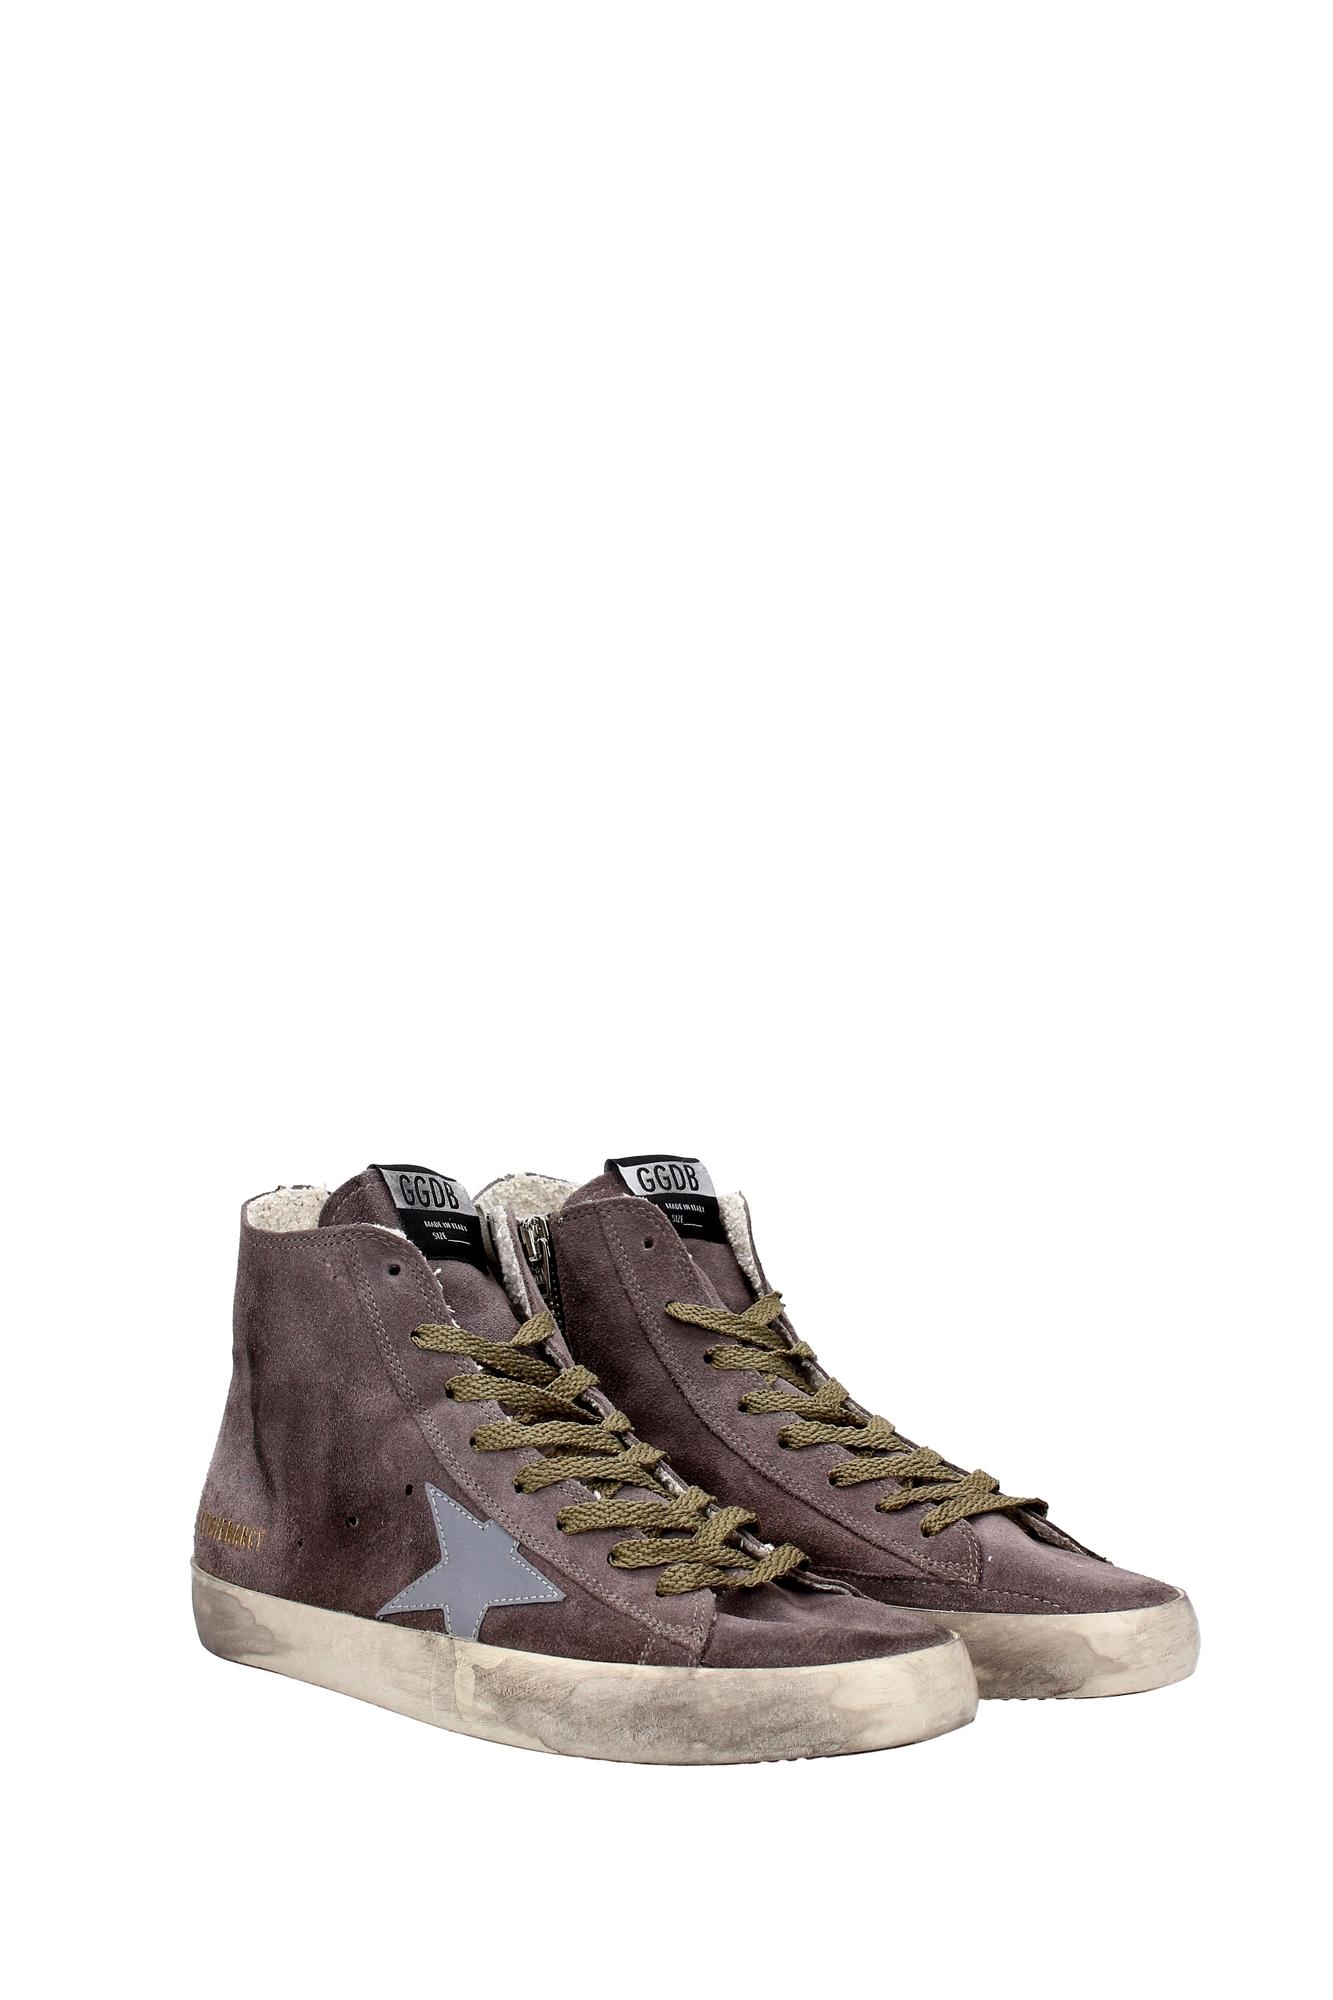 sneakers golden goose herren wildleder violett g2tu591v2 ebay. Black Bedroom Furniture Sets. Home Design Ideas